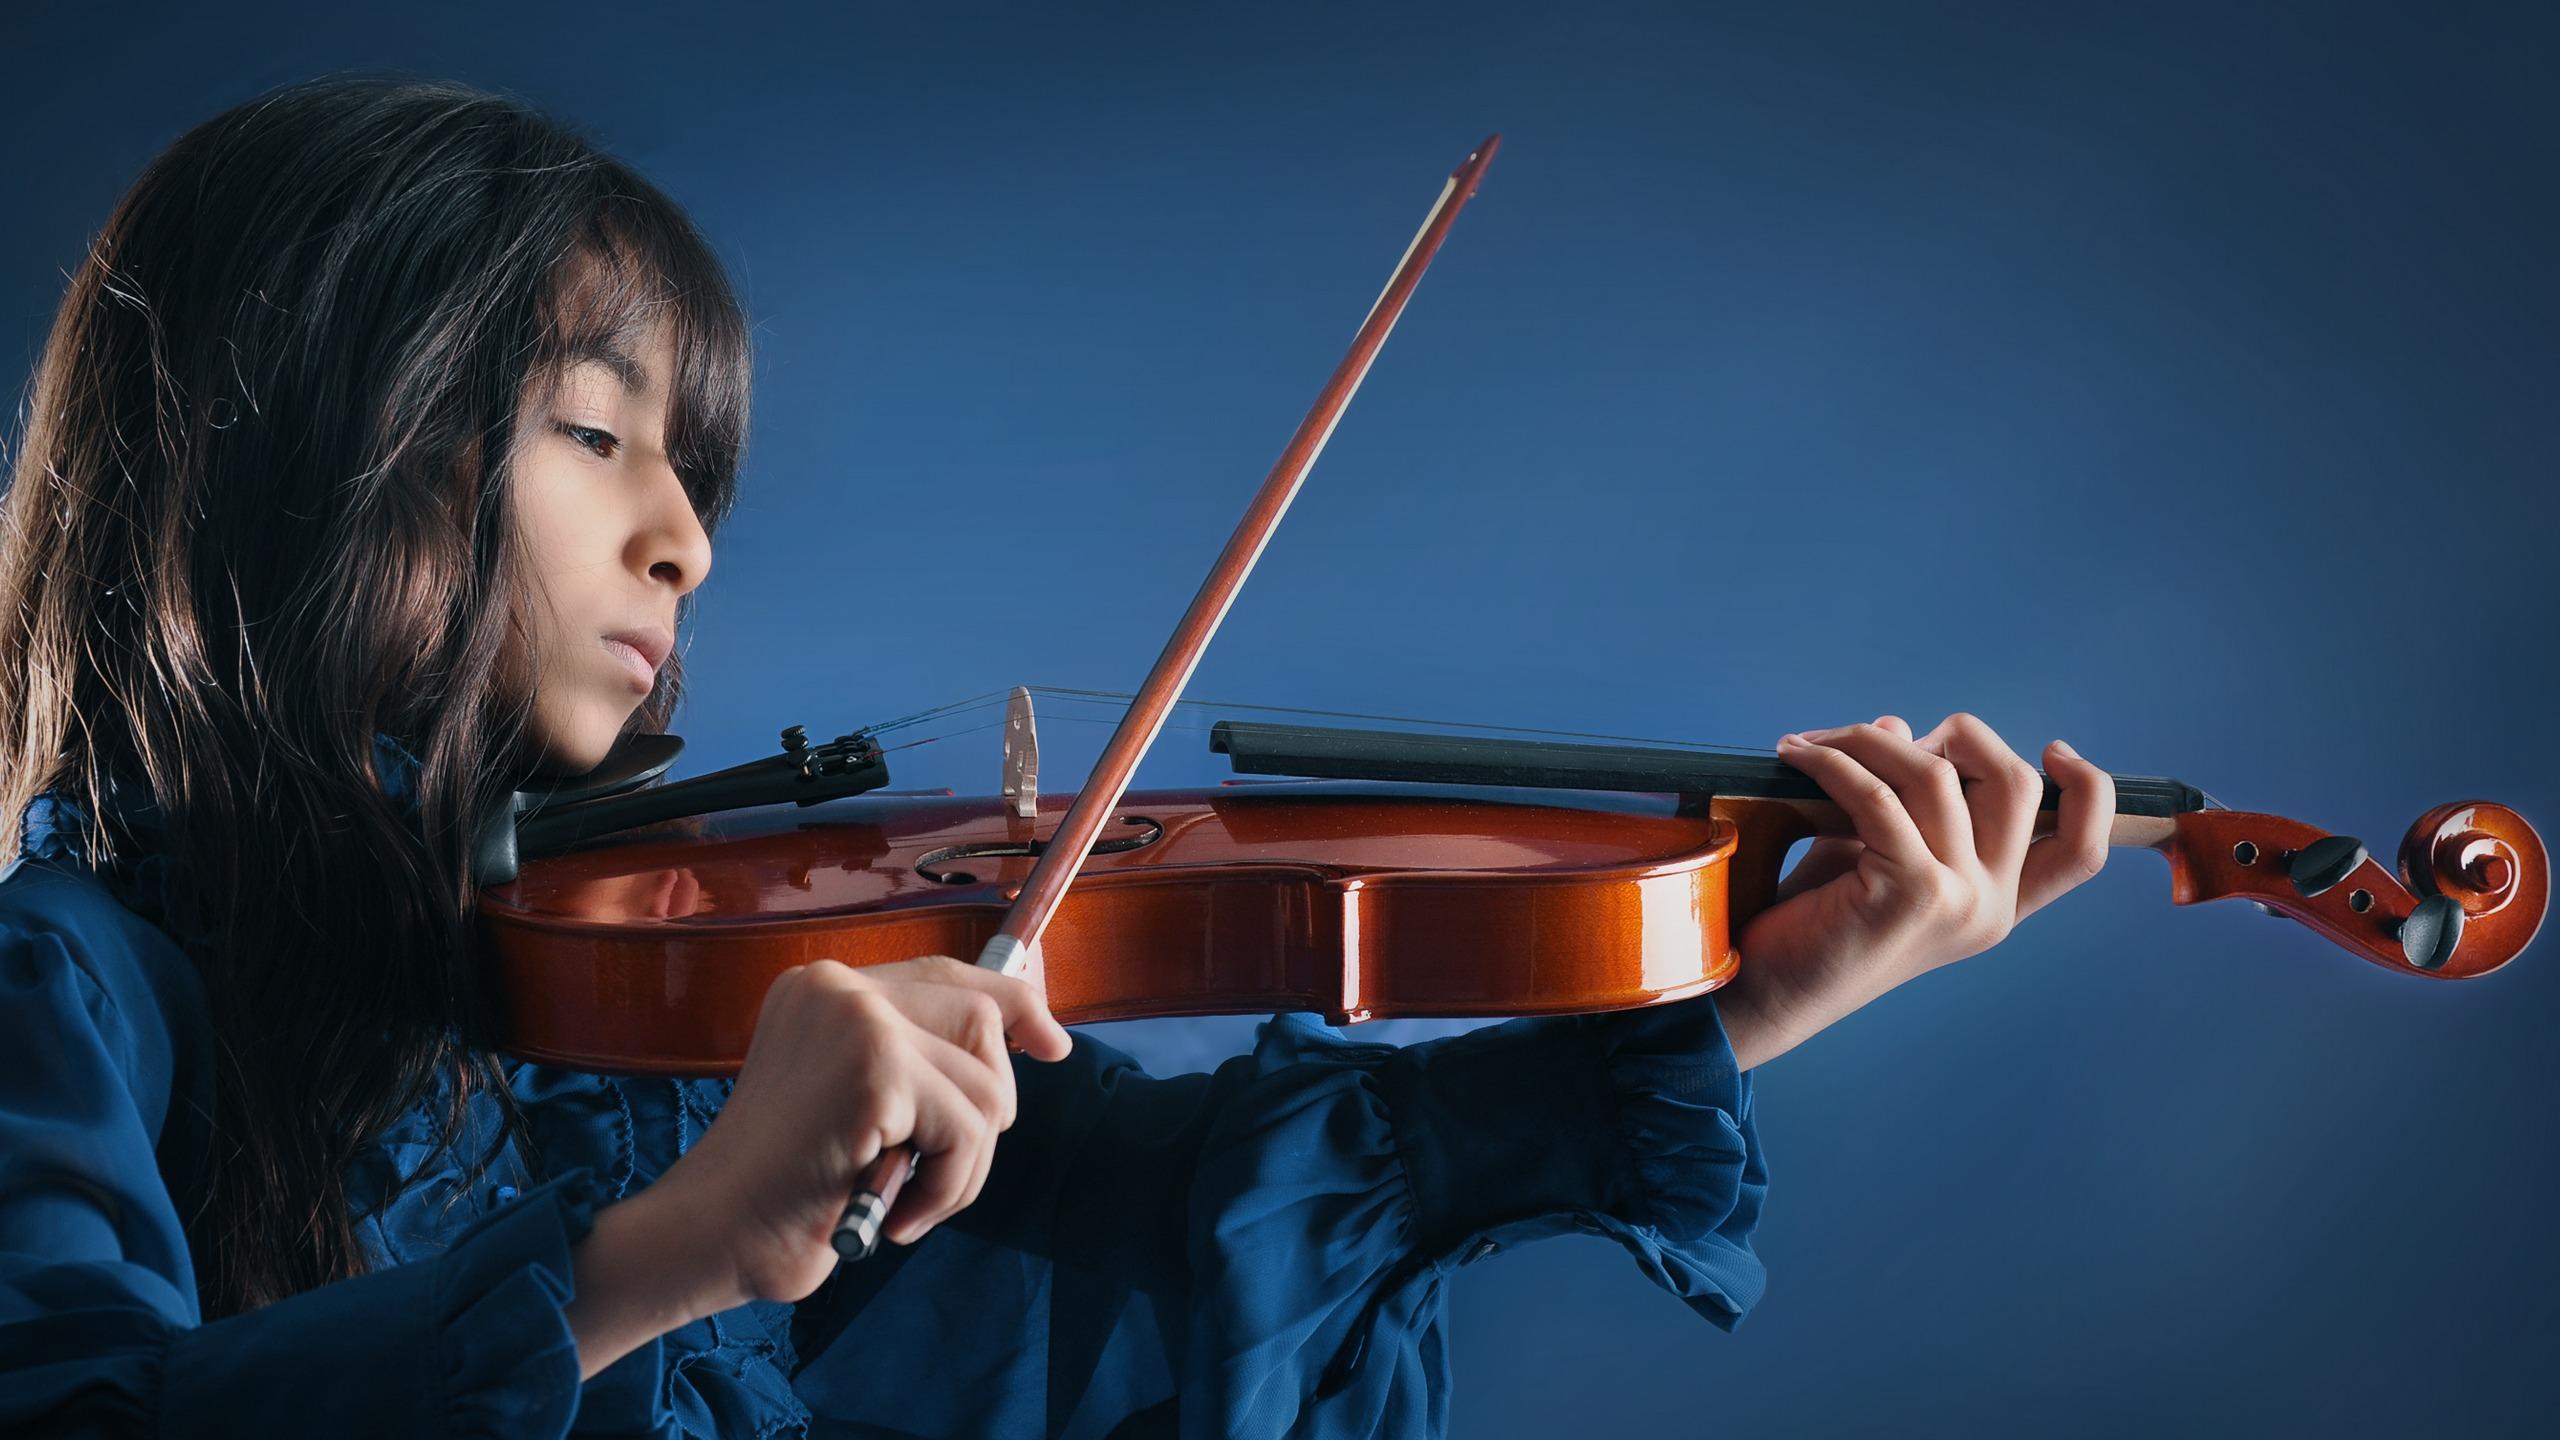 Hana Hashimoto Sixth Violin Chieri Uegaki Qin Leng on Amazoncom FREE shipping on qualifying offers In this beautifully written picture book Hana Hashimoto